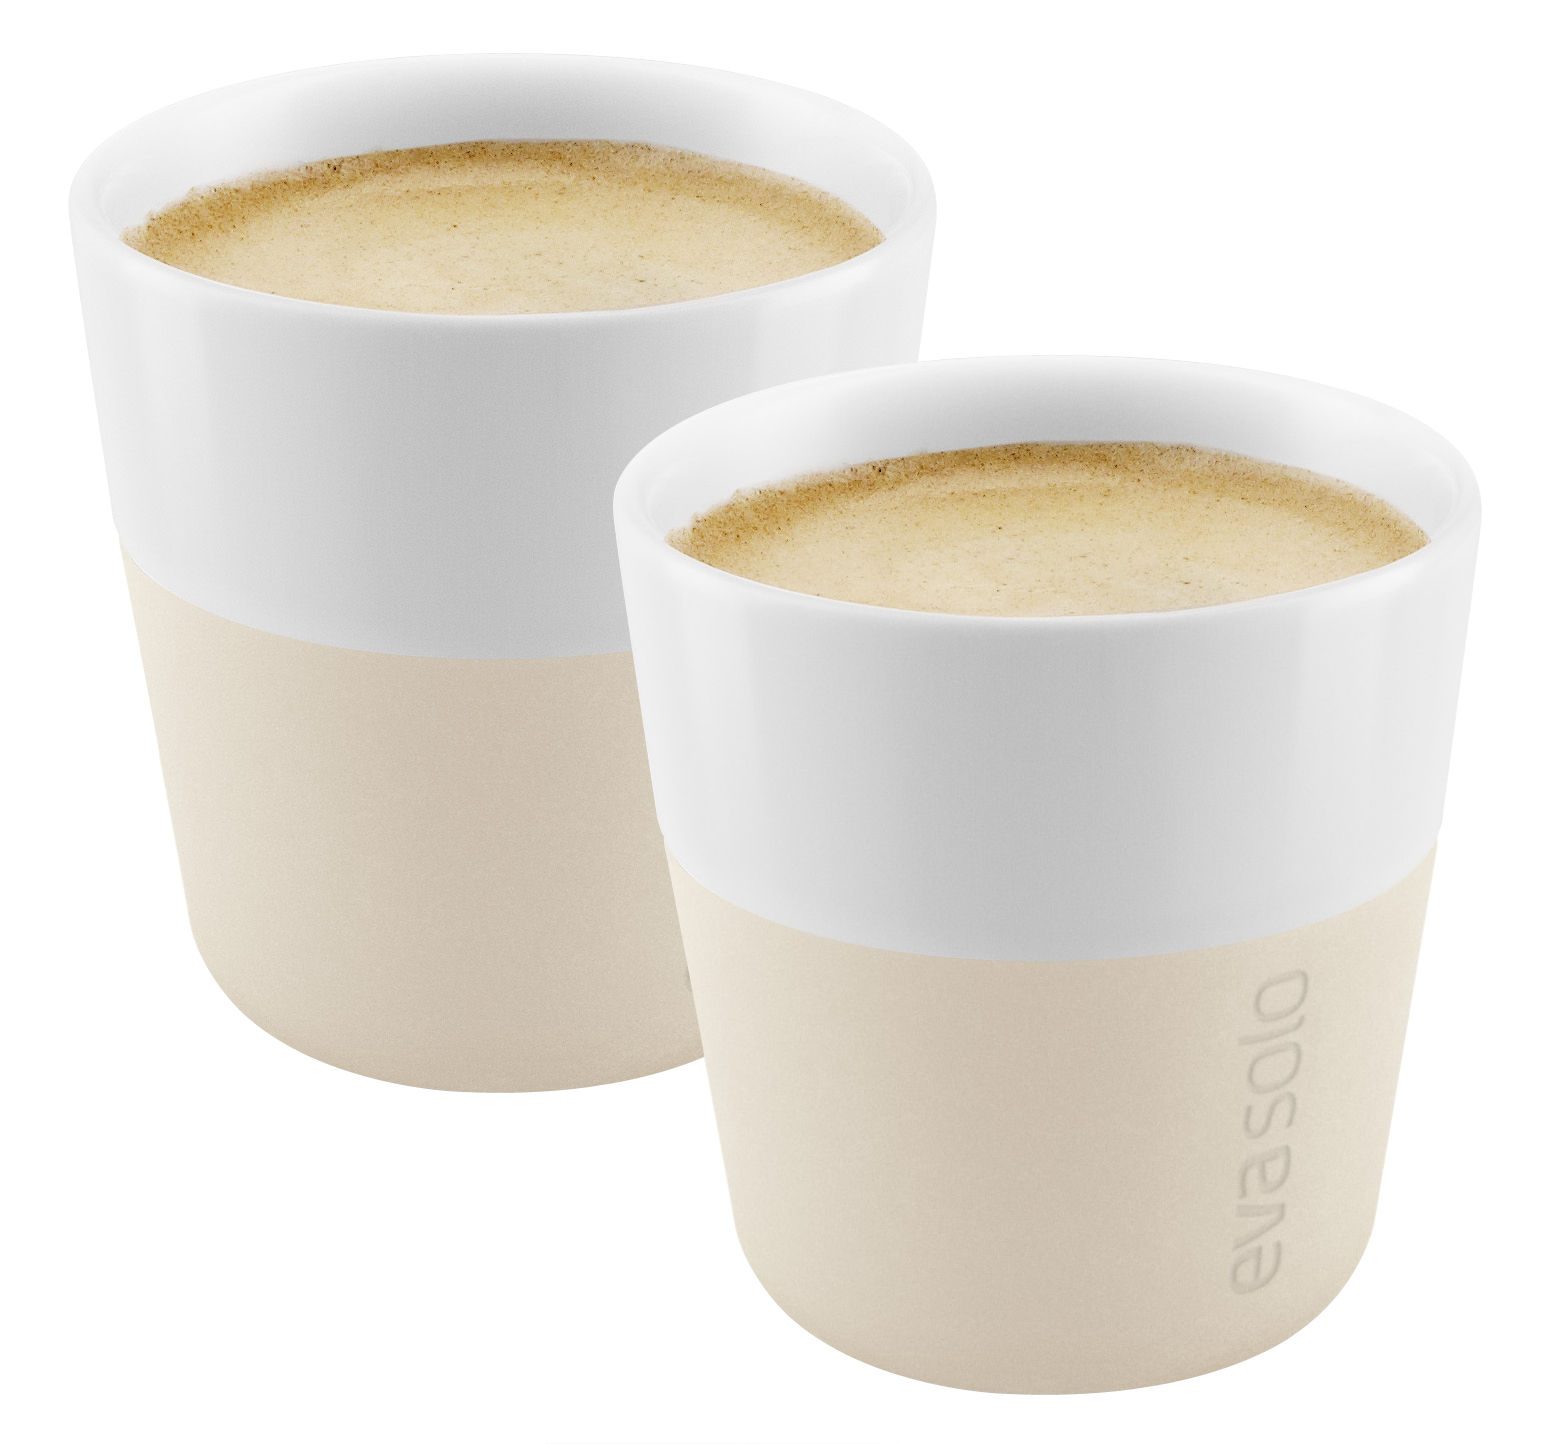 Tableware - Coffee Mugs & Tea Cups - Espresso cup - / Set of 2 - 80 ml by Eva Solo - White - China, Silicone